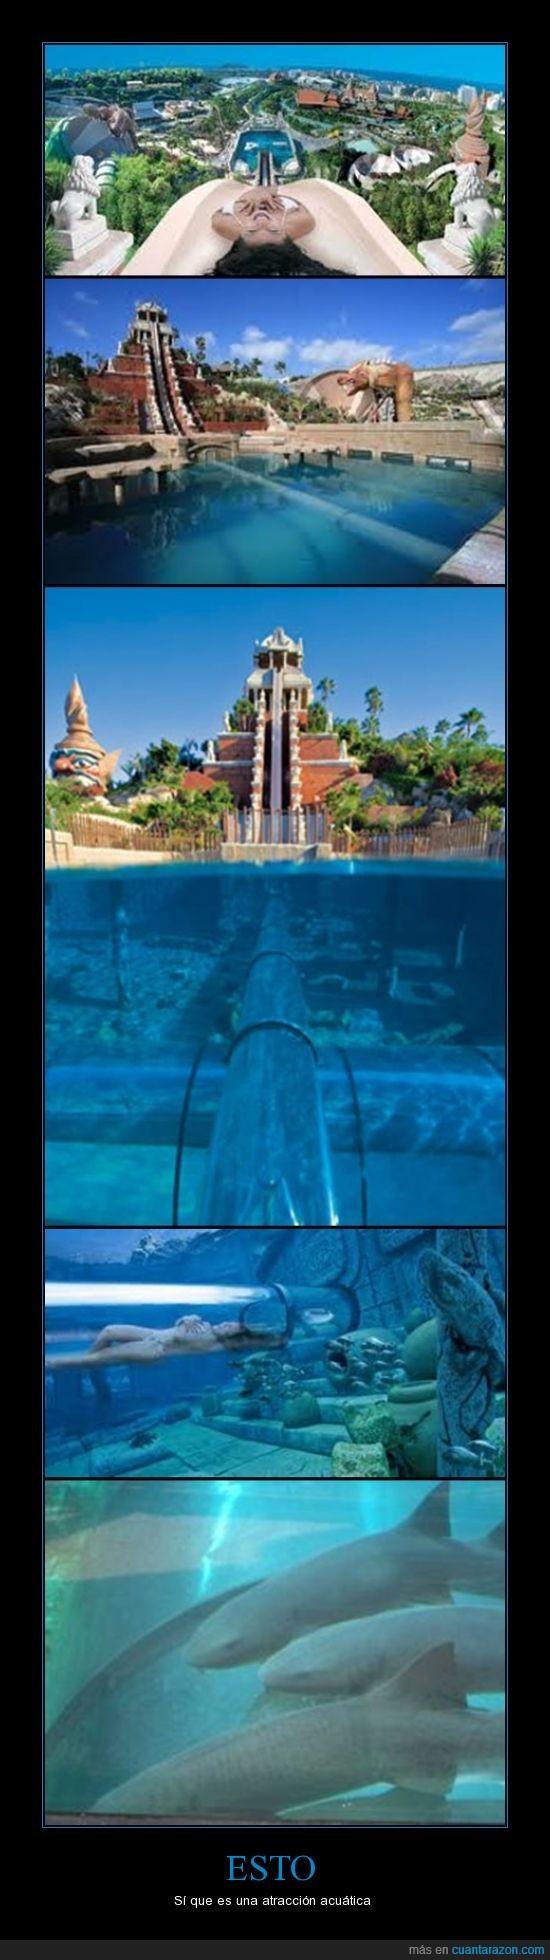 Siam park,tenerife,tiburones,tower of power